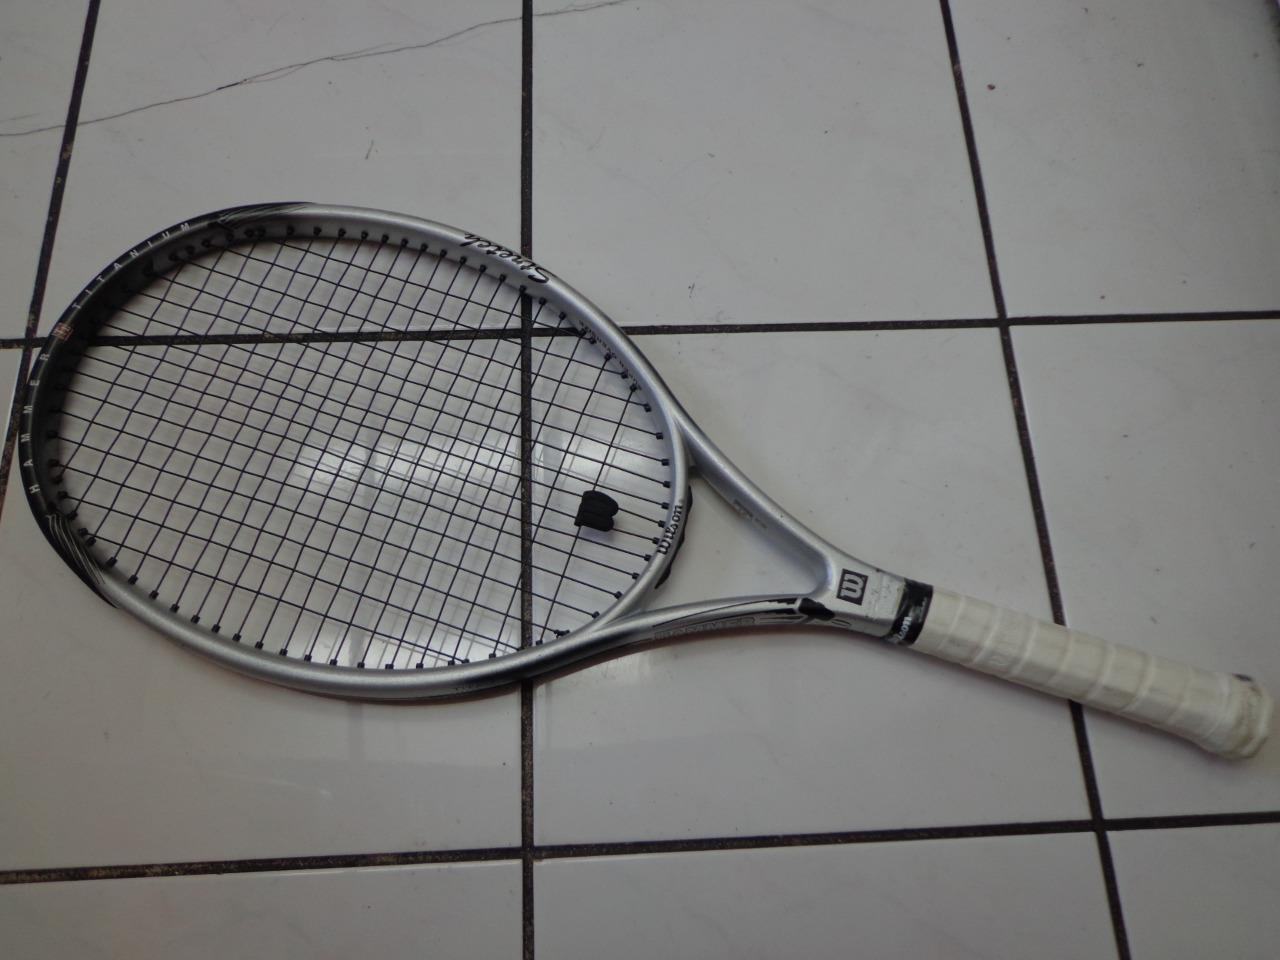 Wilson Wilson Wilson Hammer 3.0 Stretch TI. 118 head 4 3/8 grip Tennis Racquet 98464b